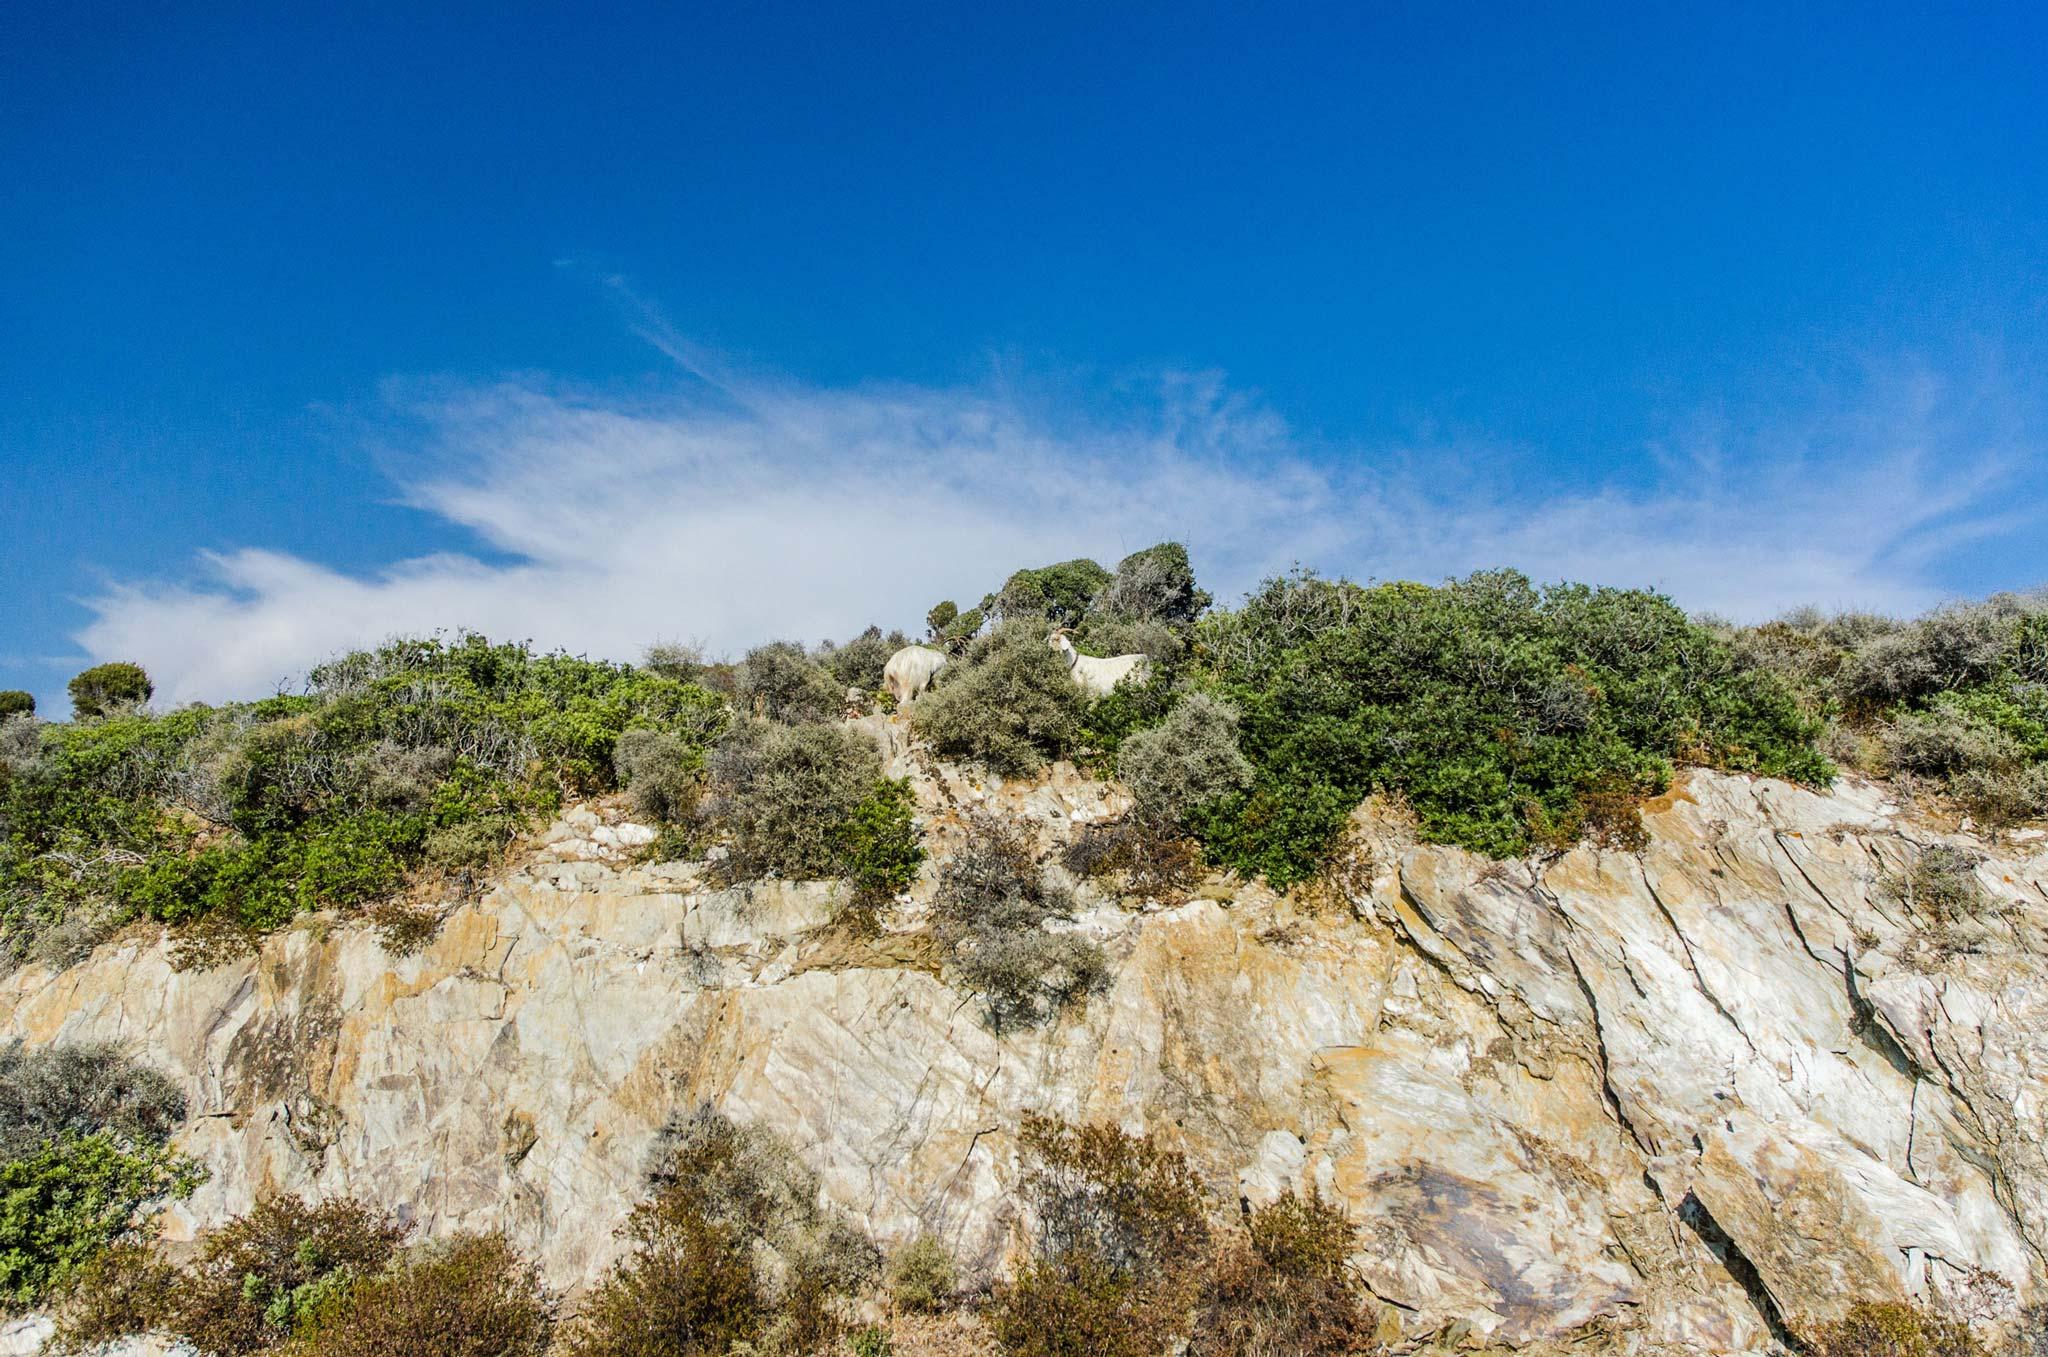 Paesaggi-Italia - DSC 9421 - Pecore-Sardegna-Fotografia-di.reportage - Pecore-Sardegna-Fotografia-di.reportage